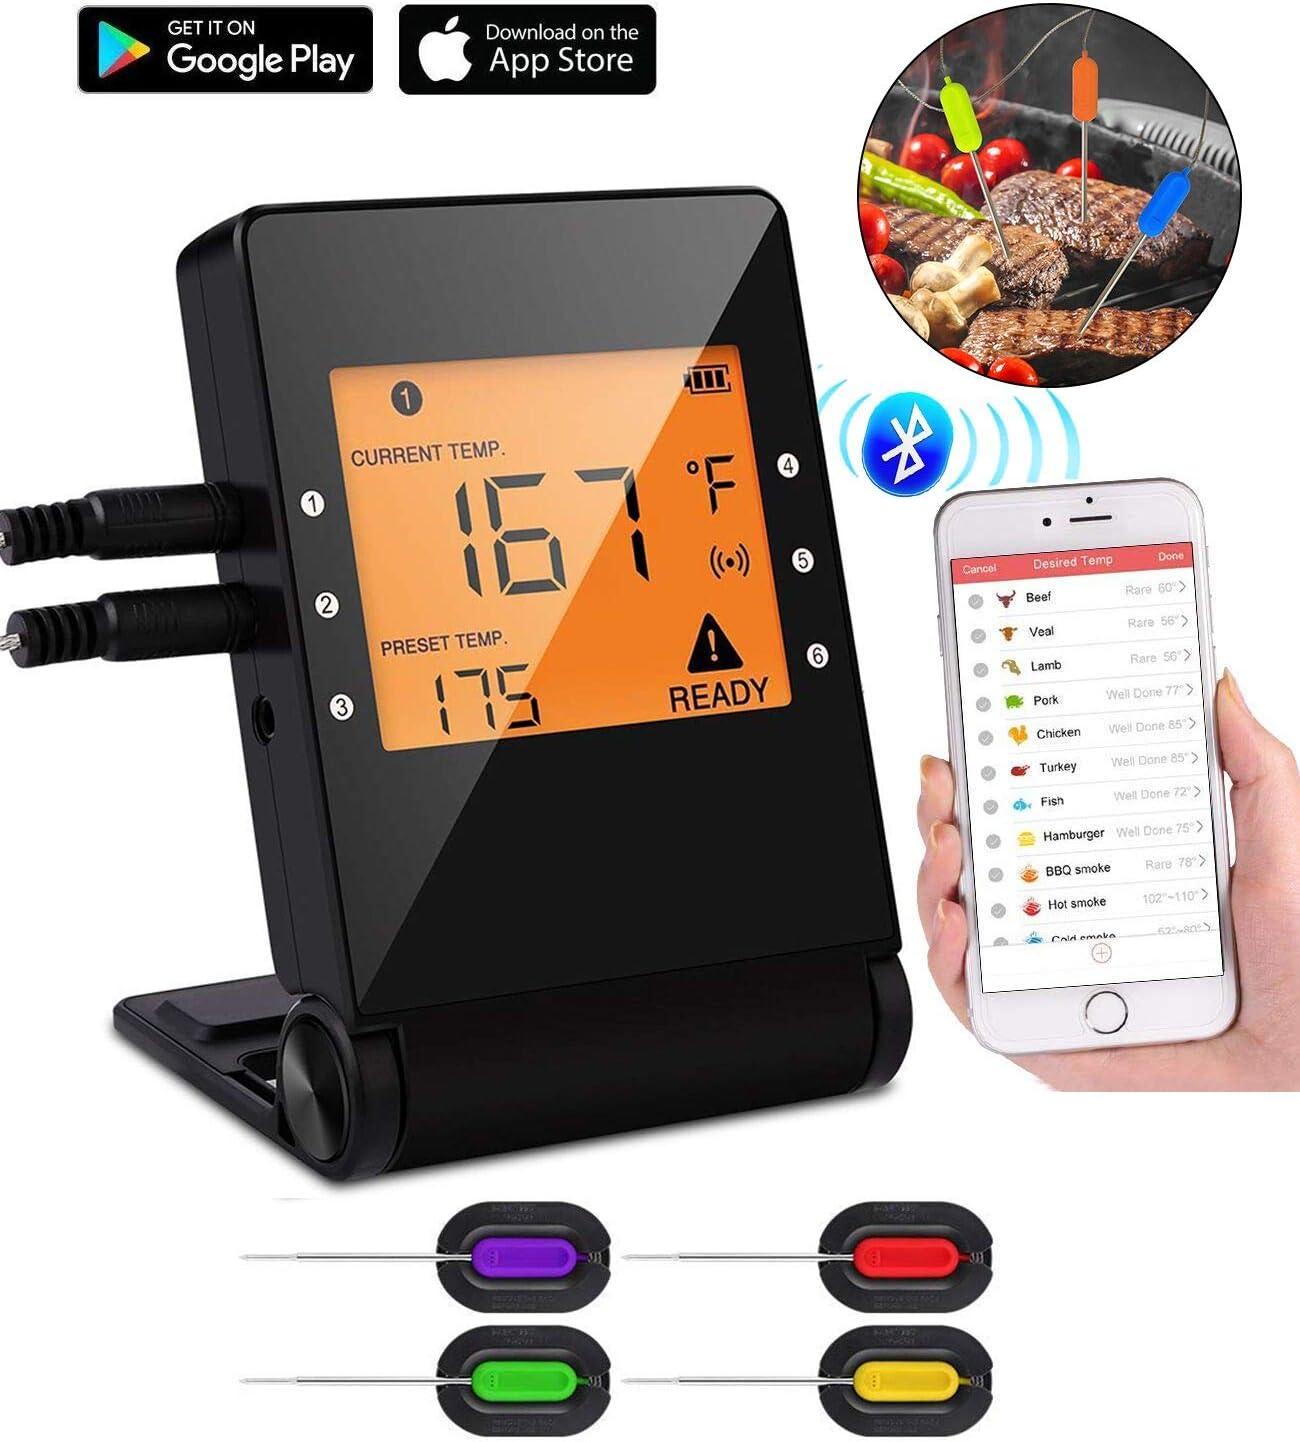 Tooklanet Termómetro de cocinar con Sondas Inteligente Bluetooth,Termómetros para Carne BBQ con LCD Pantalla, APP Remote con Alarma, perfecto para Carne,Agua, Ahorro de Espacio,Varias Sondas. 4 pack